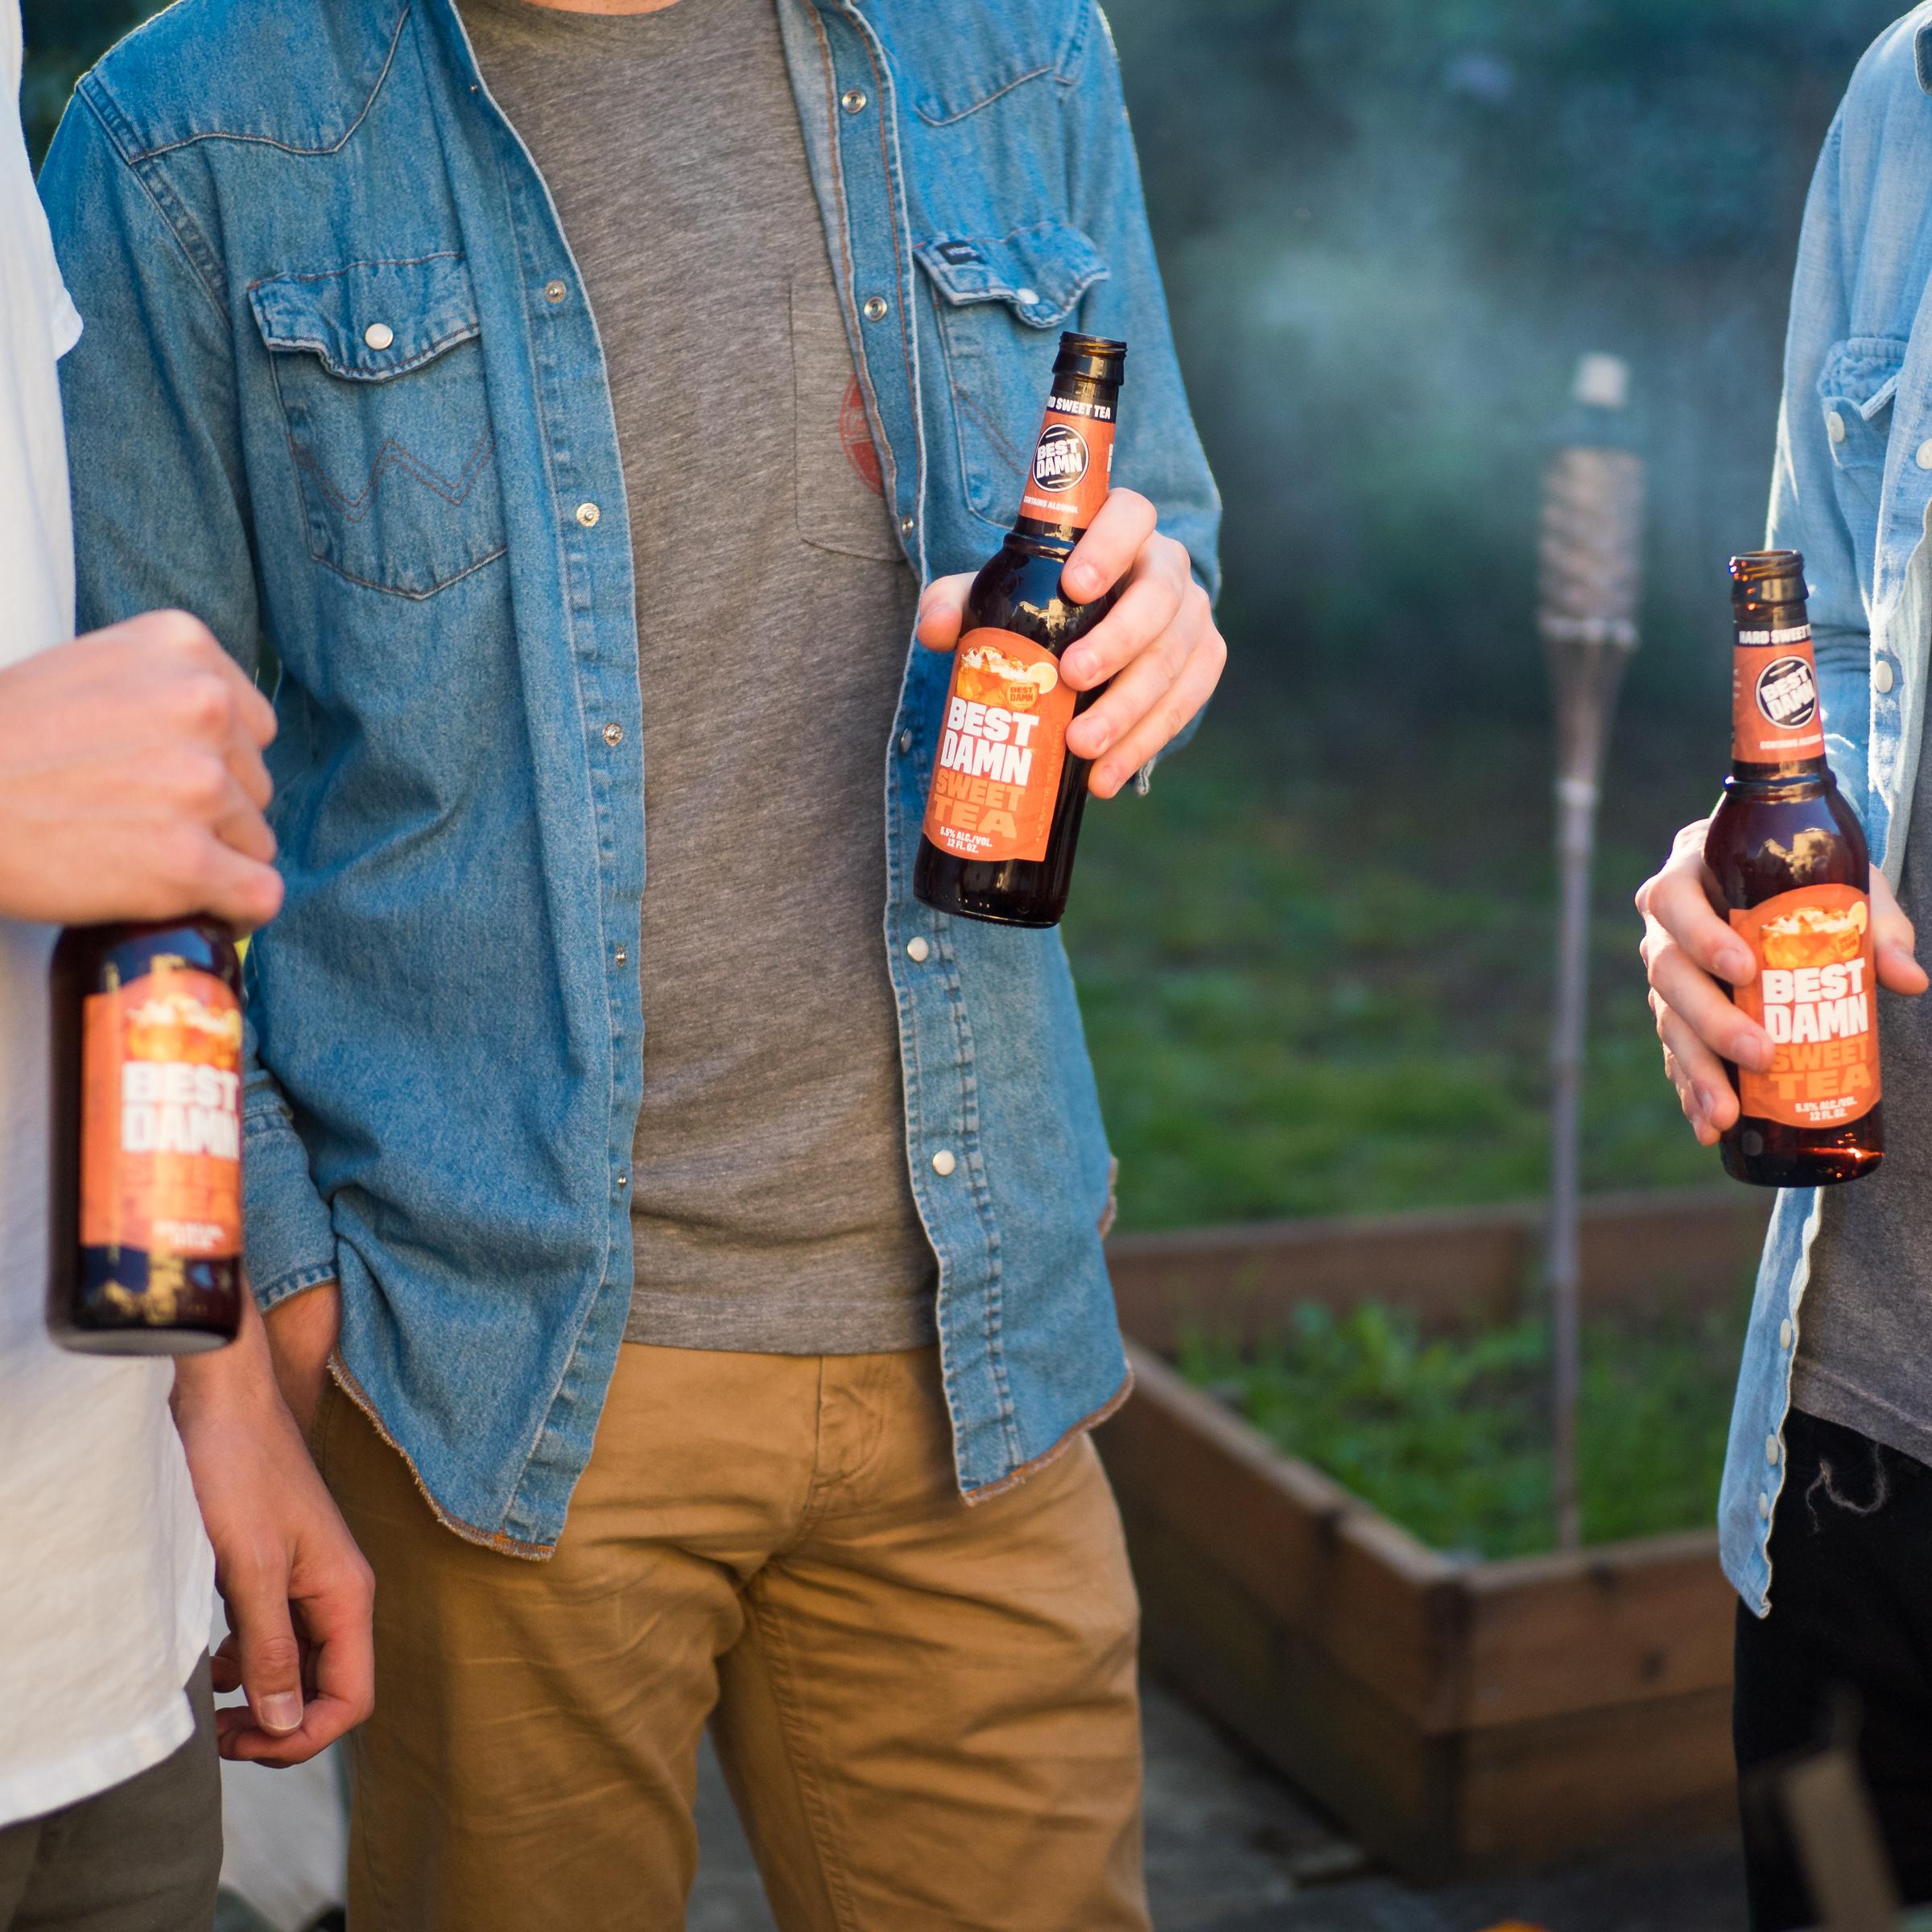 portland oregoncinemagraphfood beverage photography jeremypawlowski eats portland eatsamerica americayall